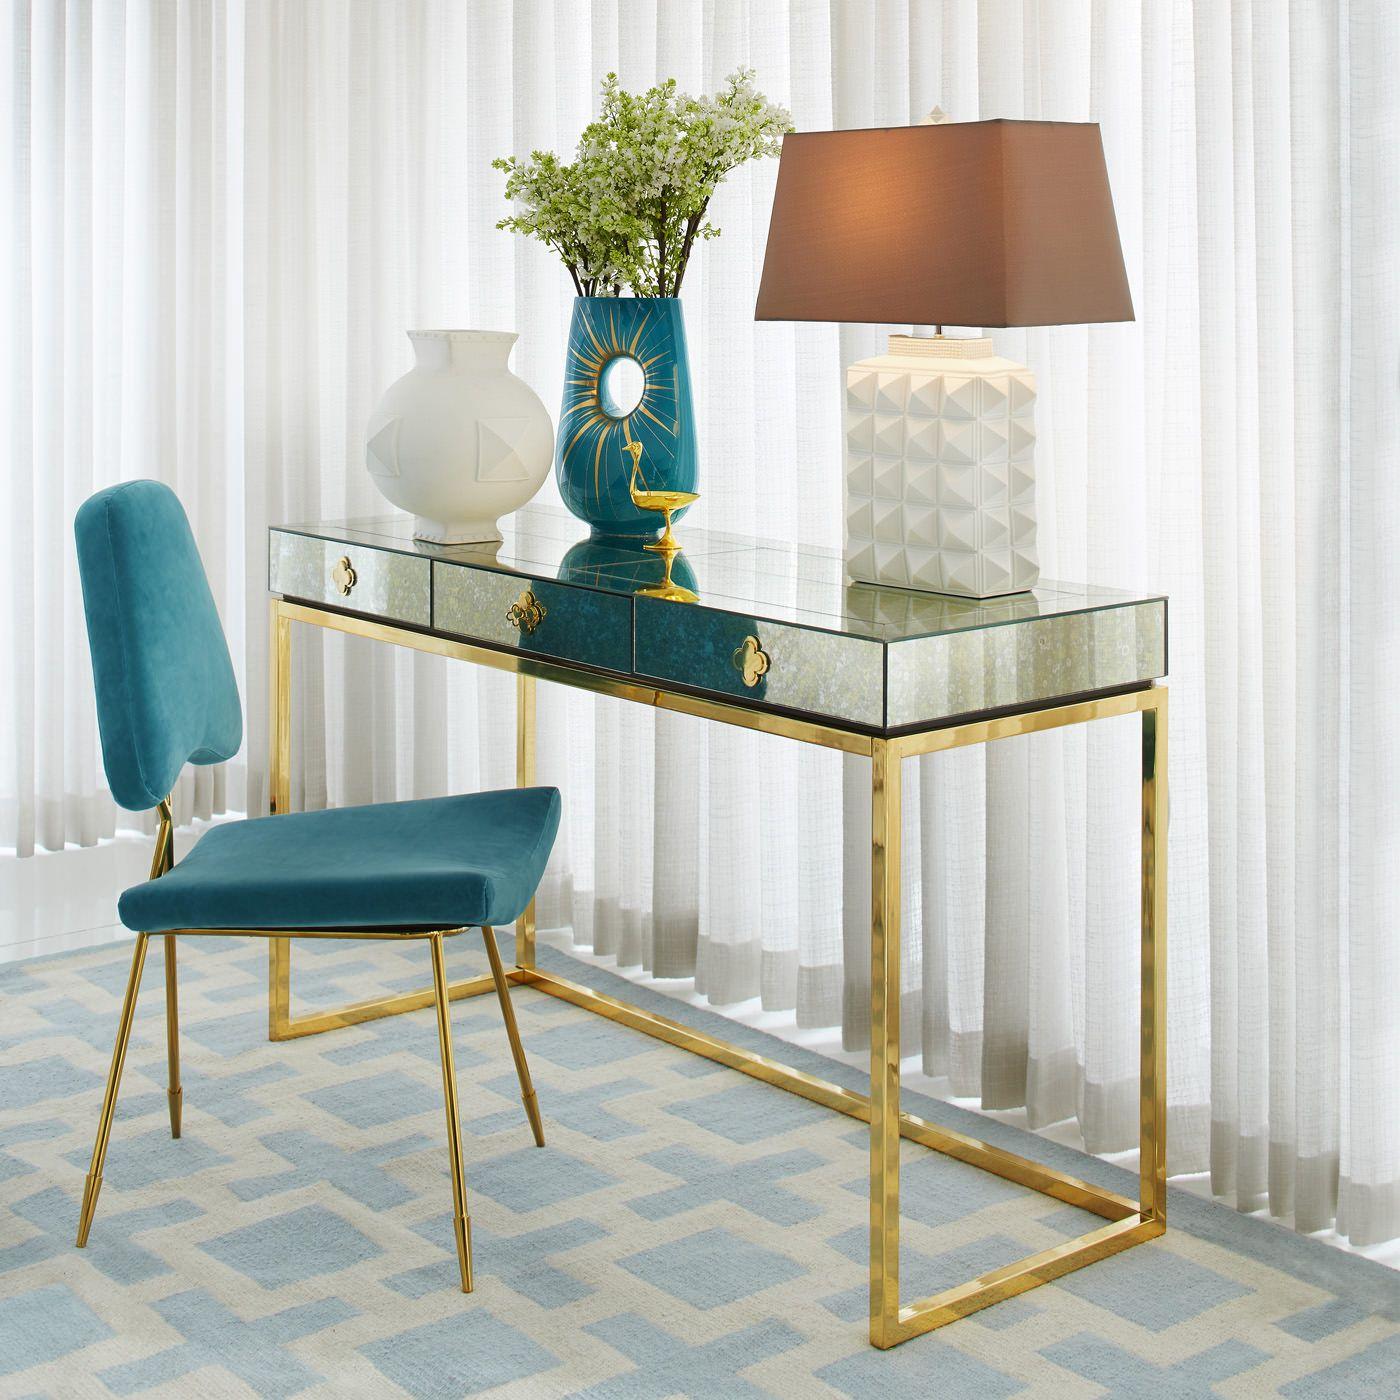 Desks - Delphine Desk Vanity Q: 1